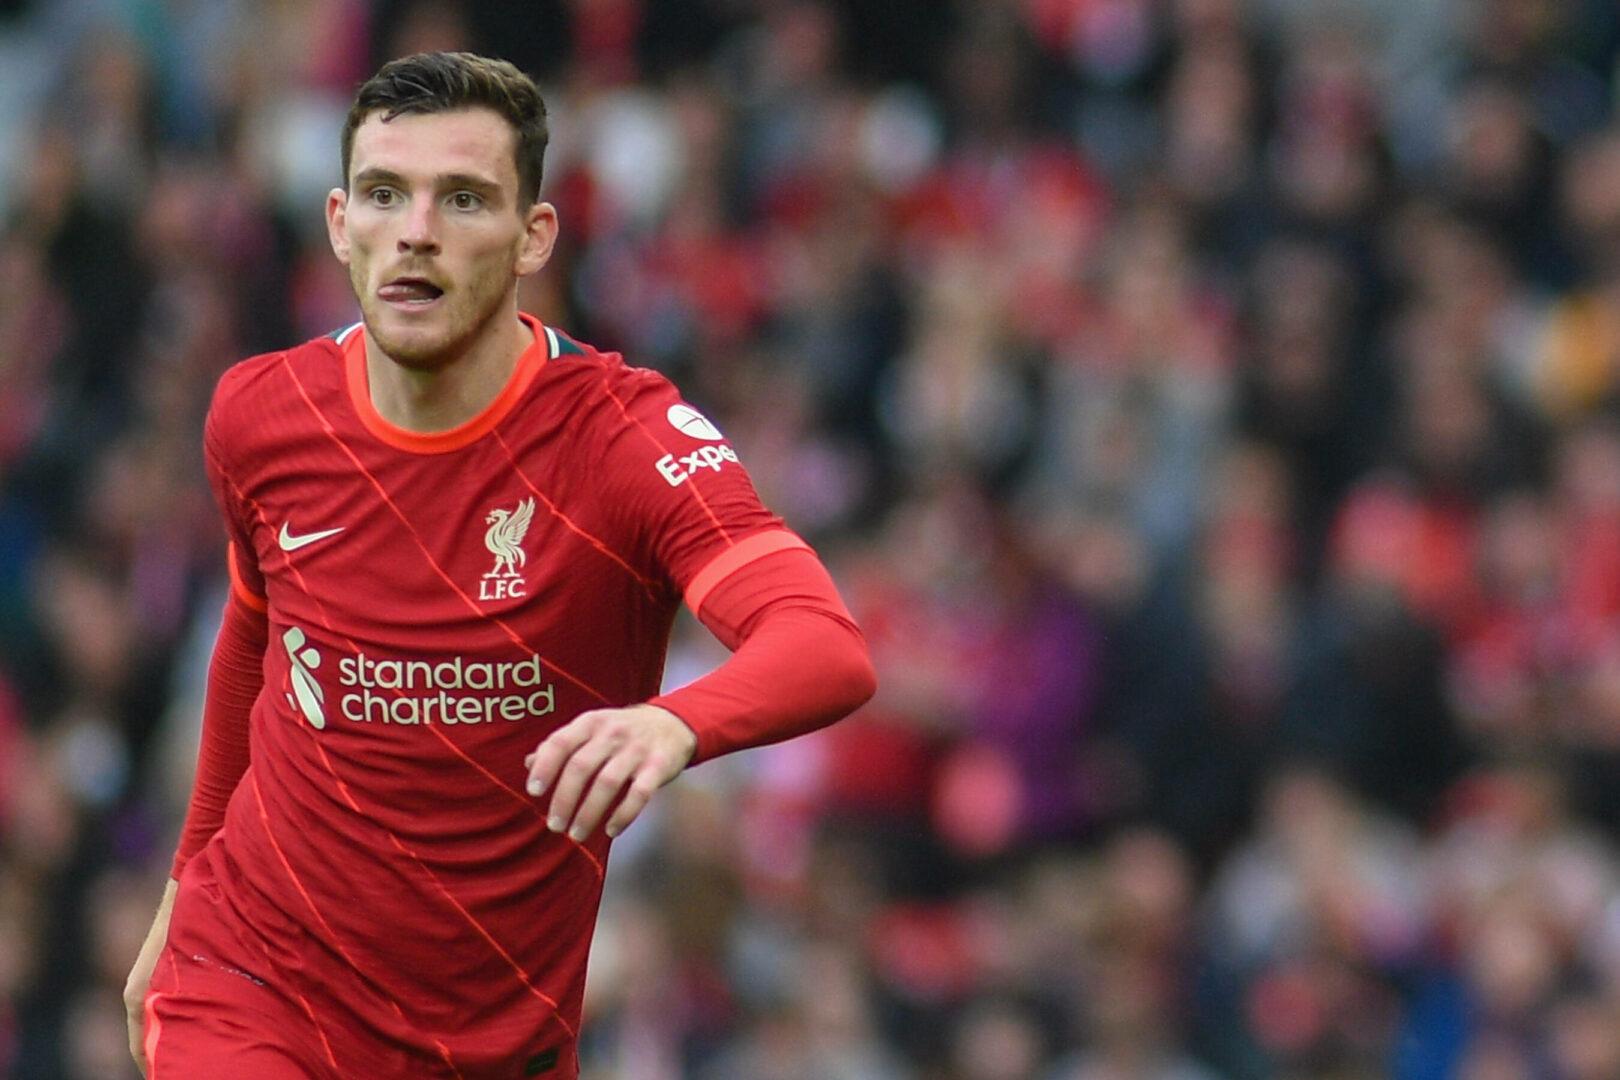 Andy Robertson vom FC Liverpool fixiert den Ball